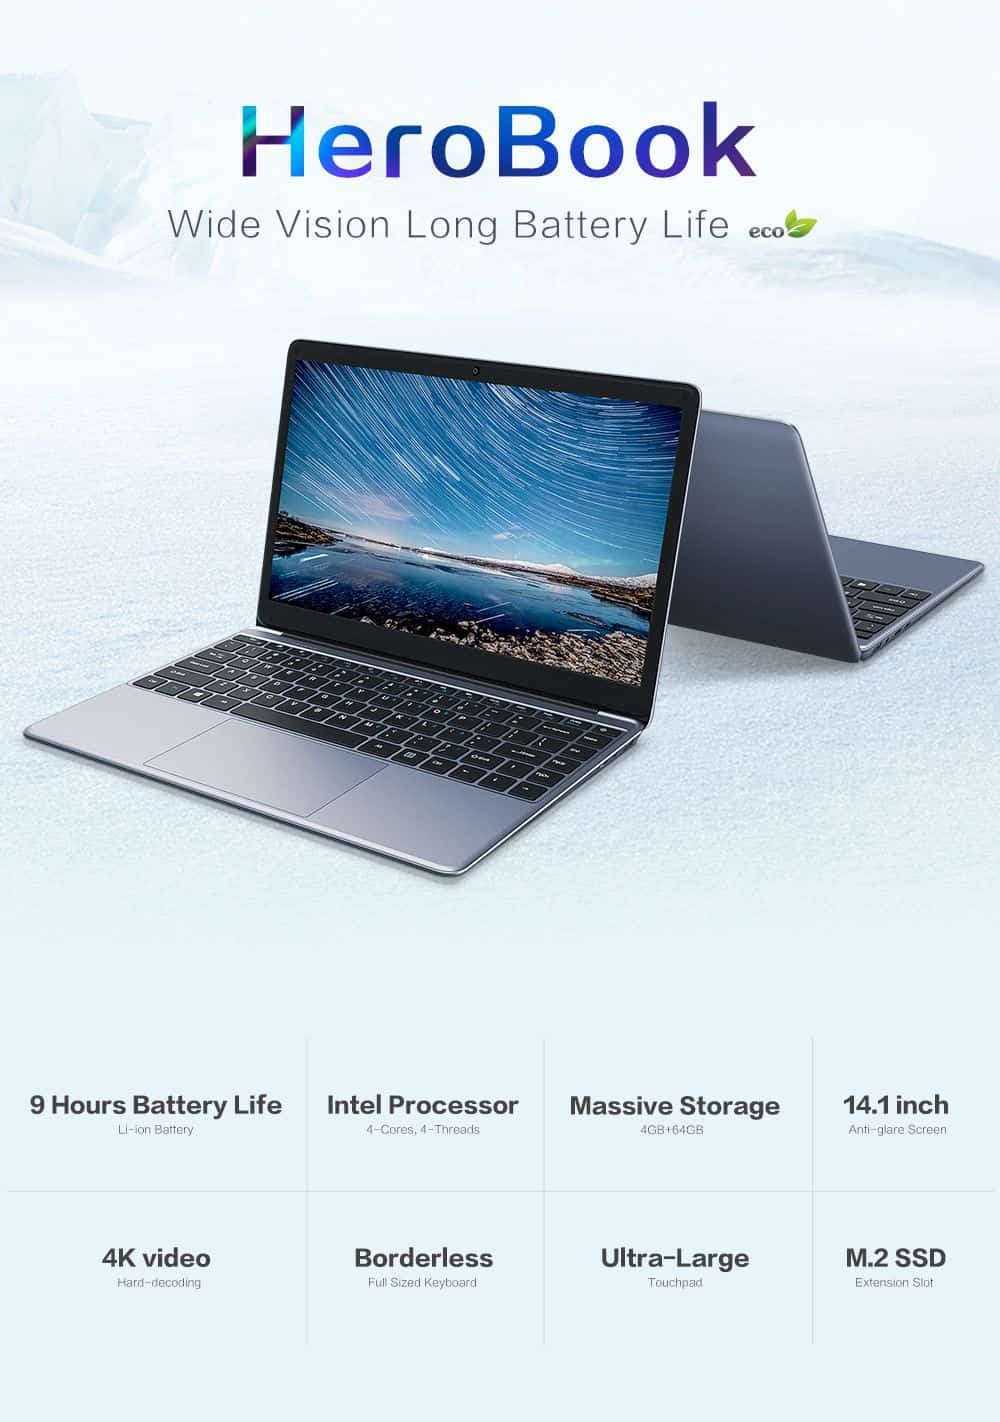 Offerta CHUWI HeroBook, ultrabook cinese da 14,1 pollici, 4GB di ram